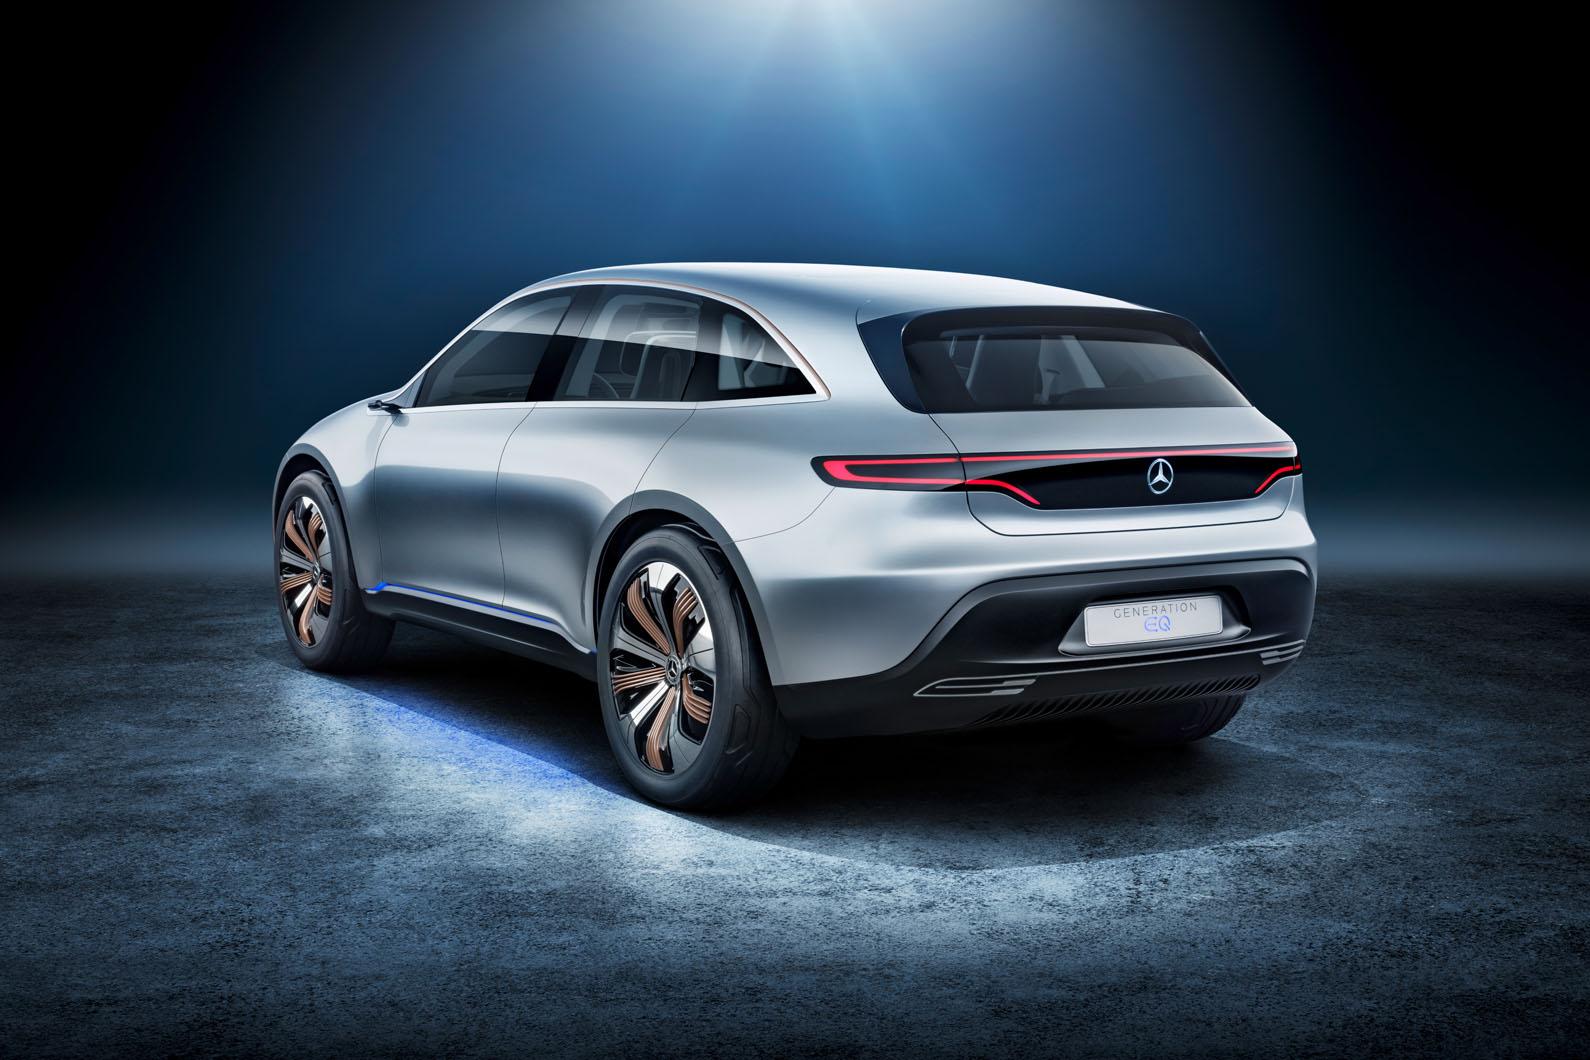 Mercedes Generation Eq Concept Revealed At Paris Motor Show Autocar Benz Electrical